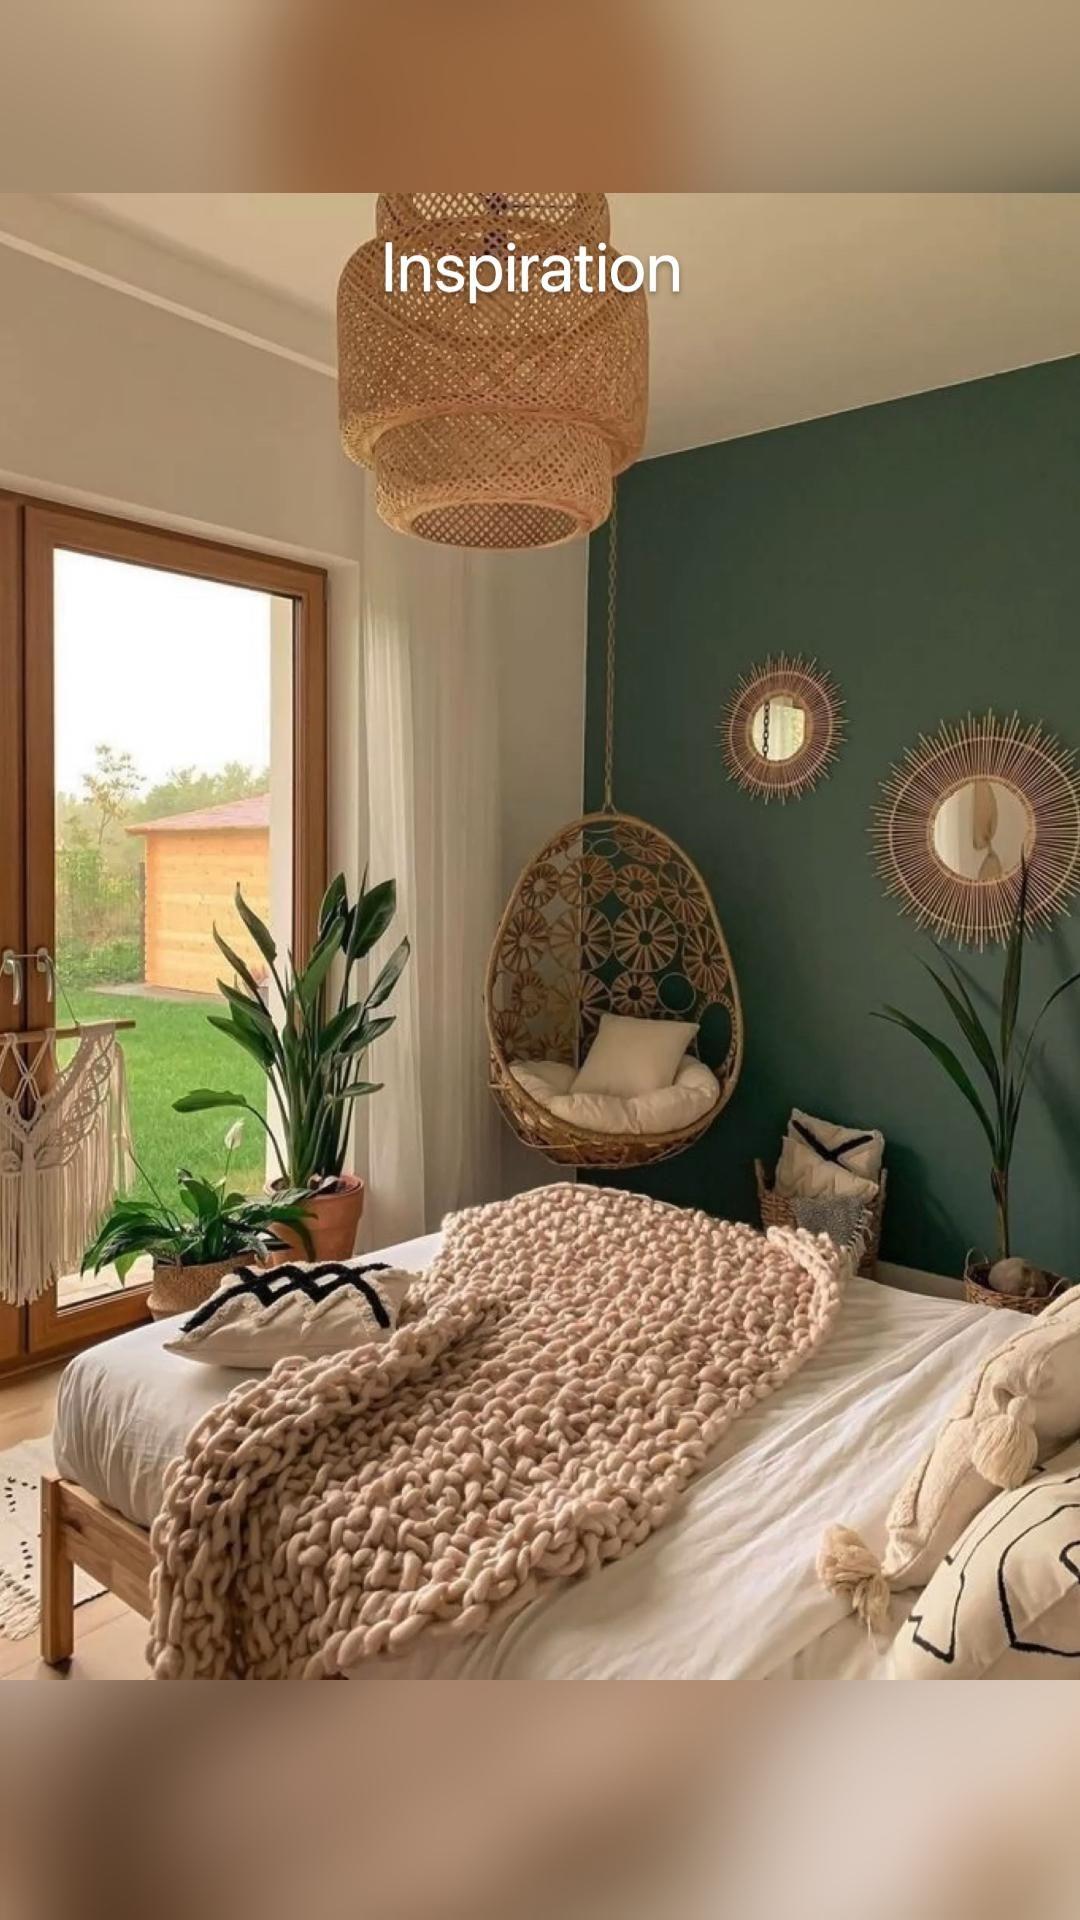 Guest bedroom, Hawaiian themed, hula girl and pineapple decor.